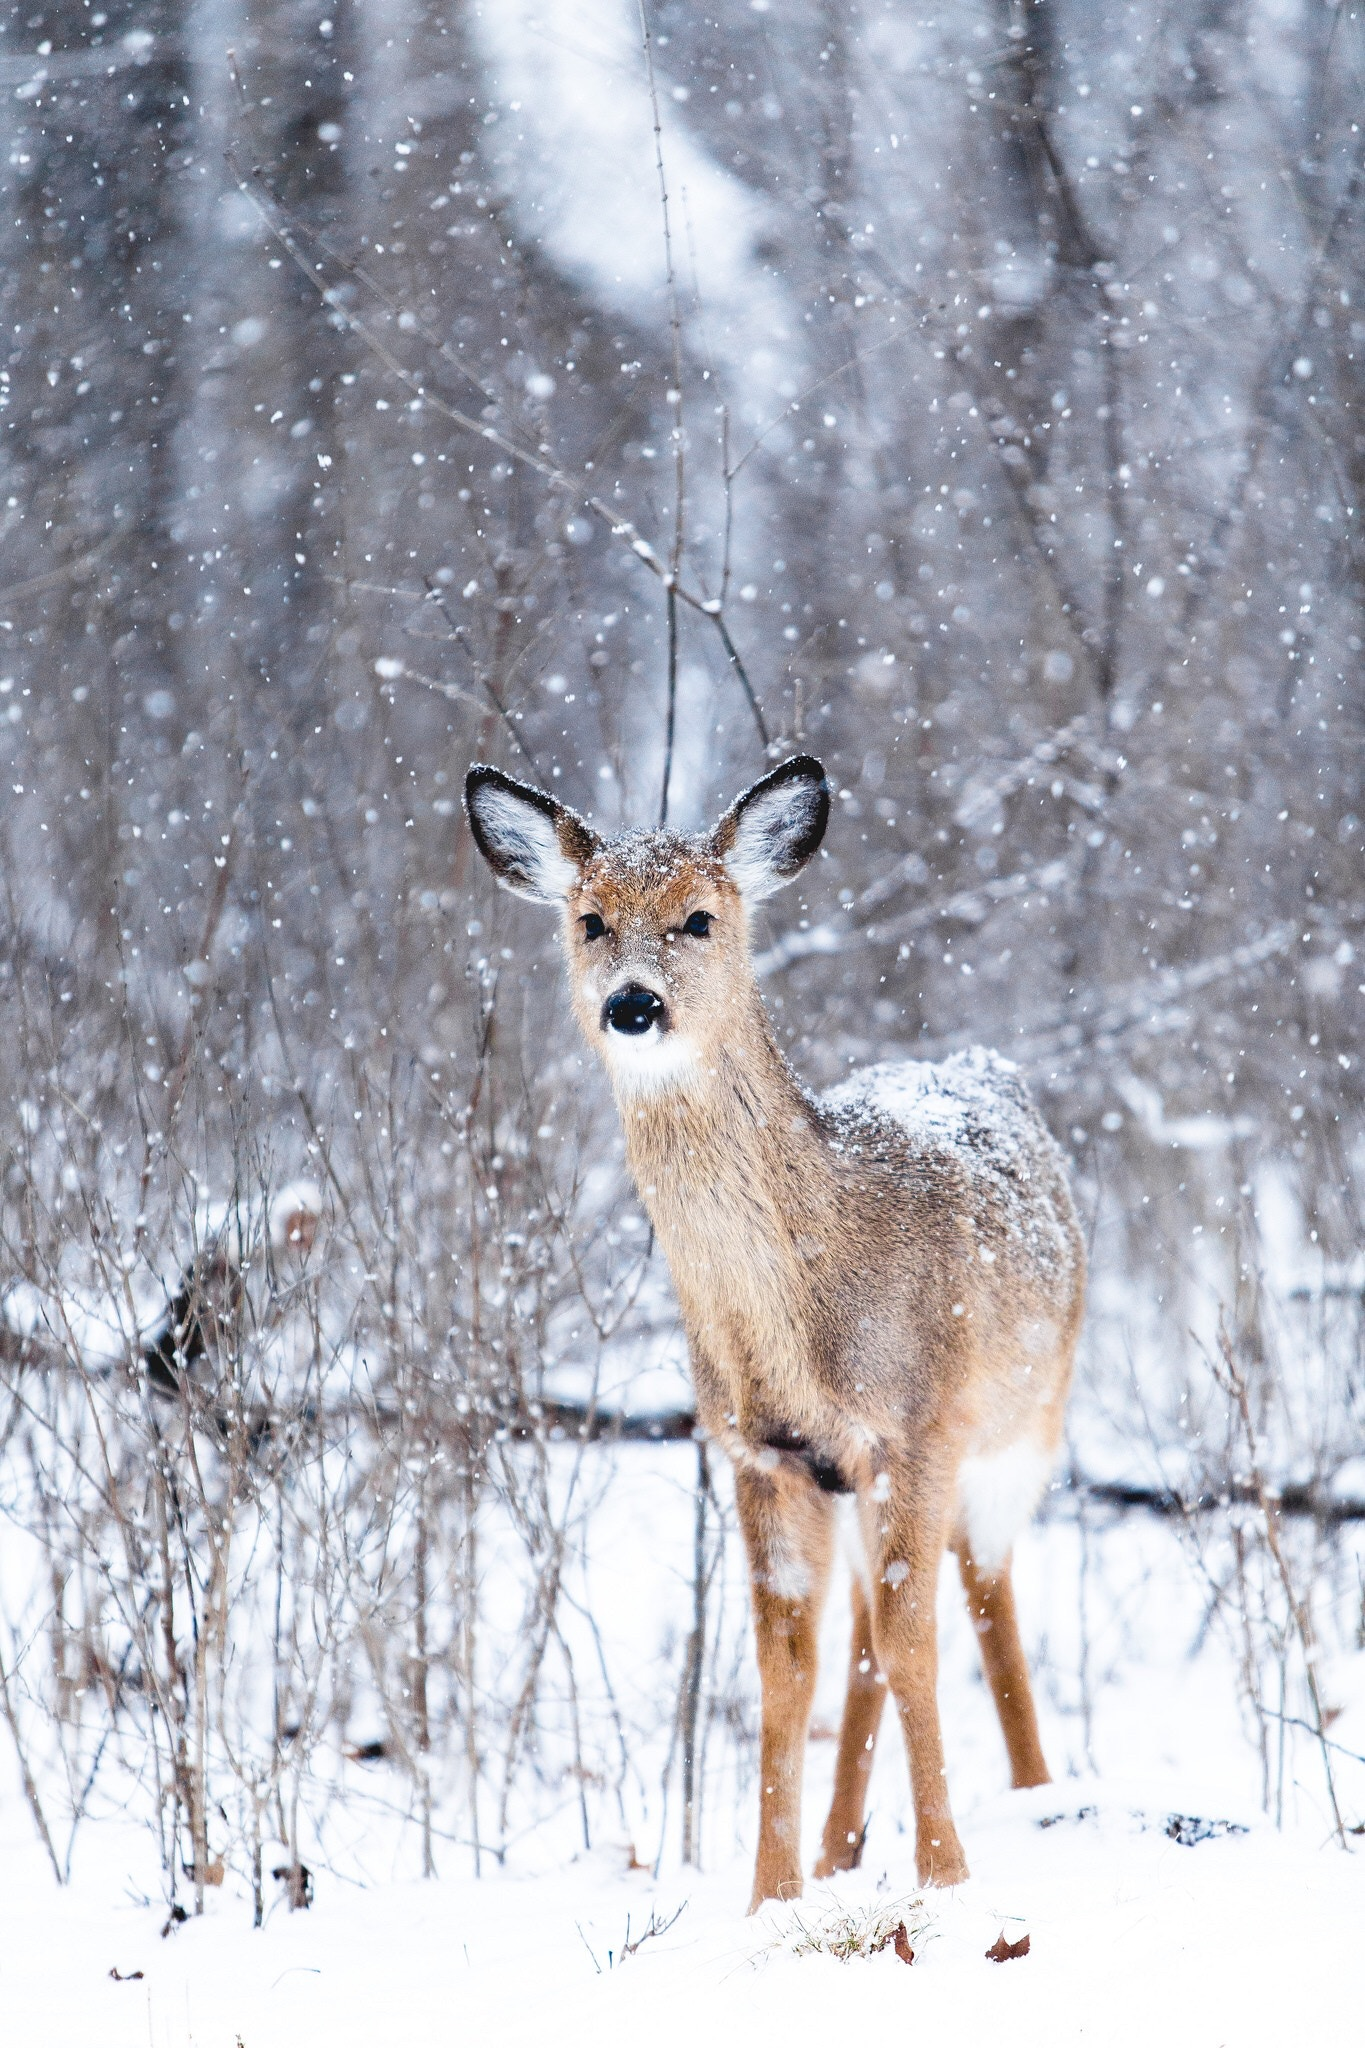 LIVE! Snowy Deer in Watercolor Tutorial 12:30pm ET